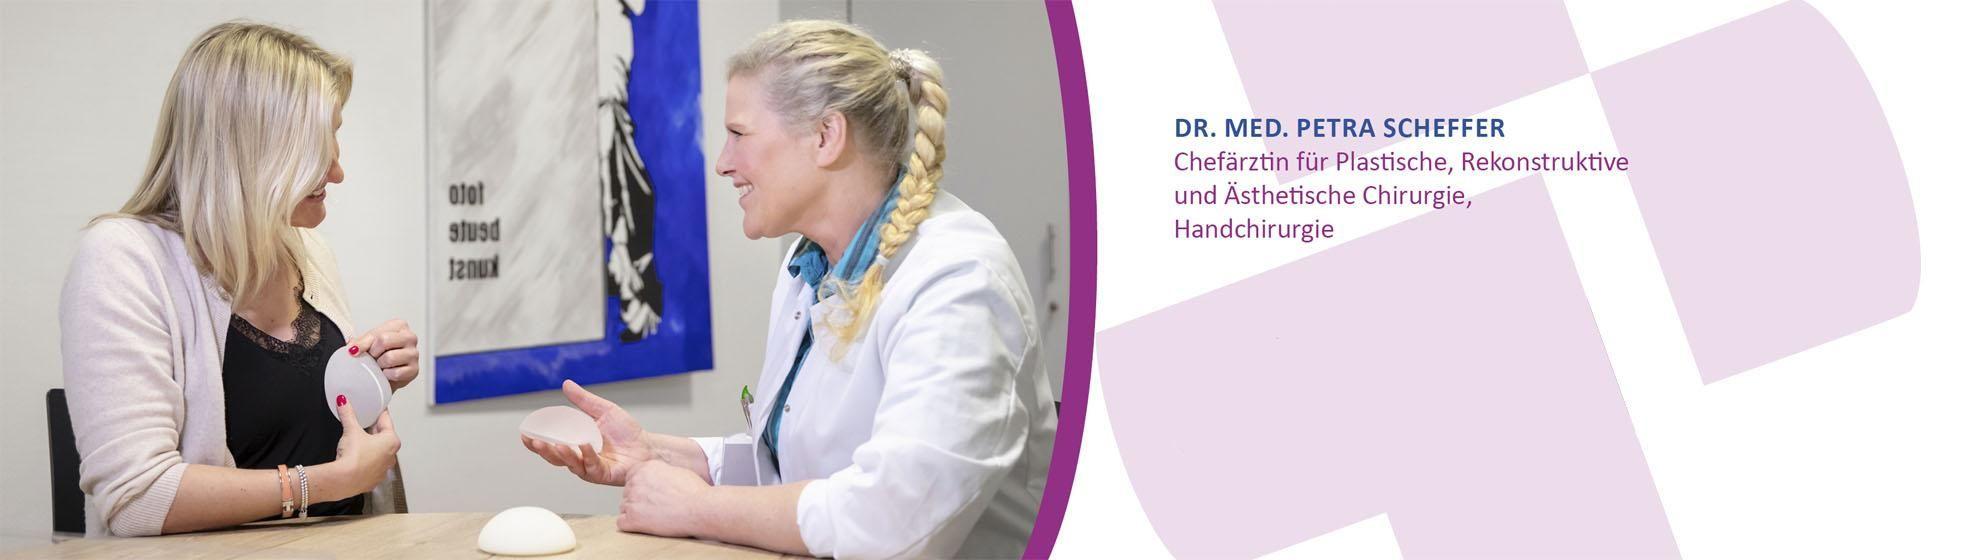 Dr. med. Petra Scheffer